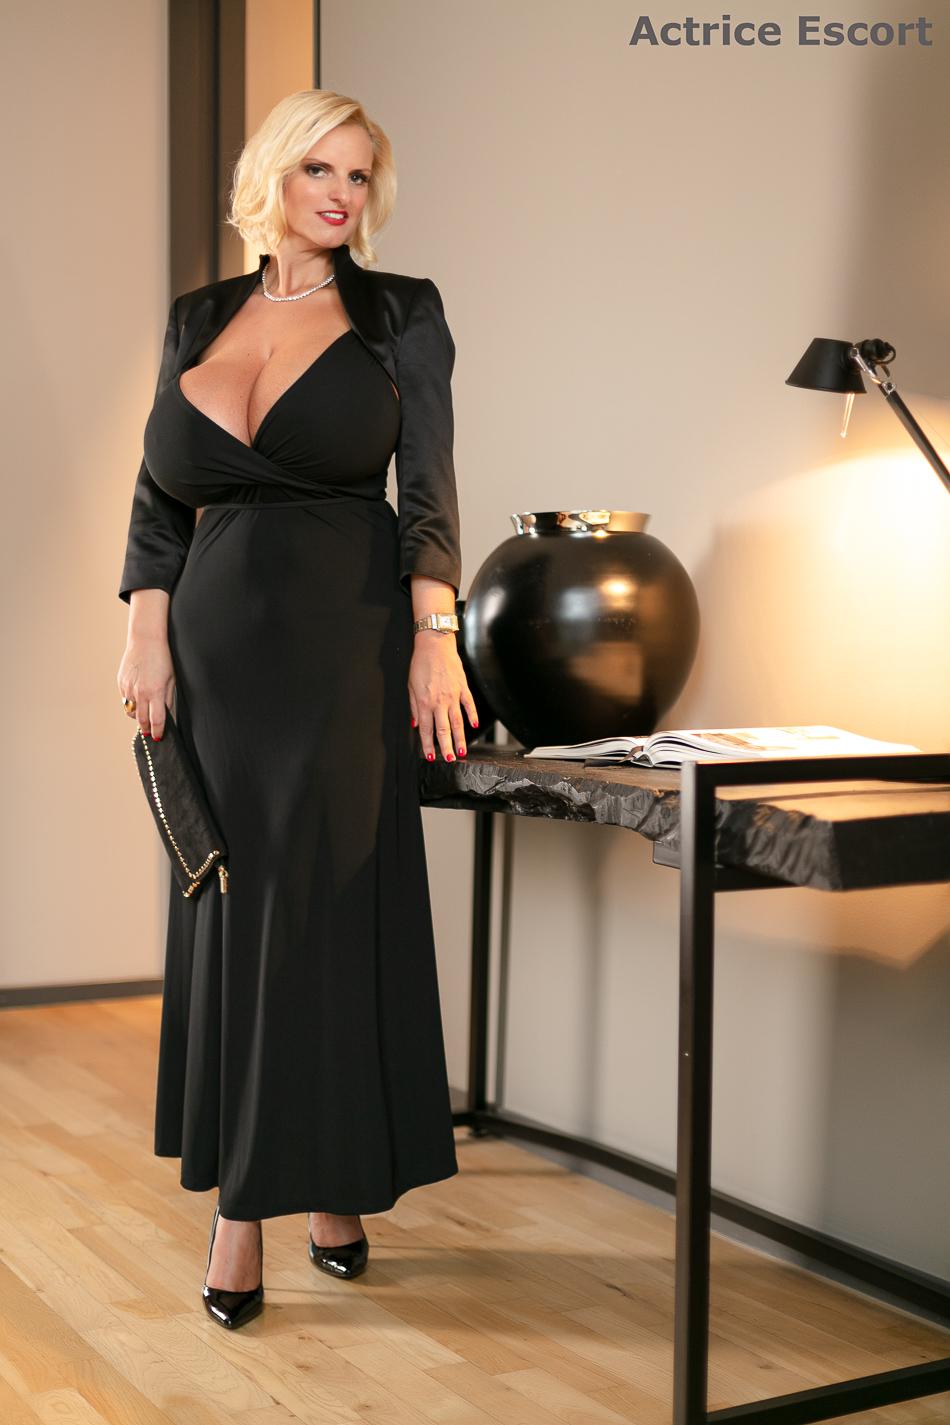 Actrice escort